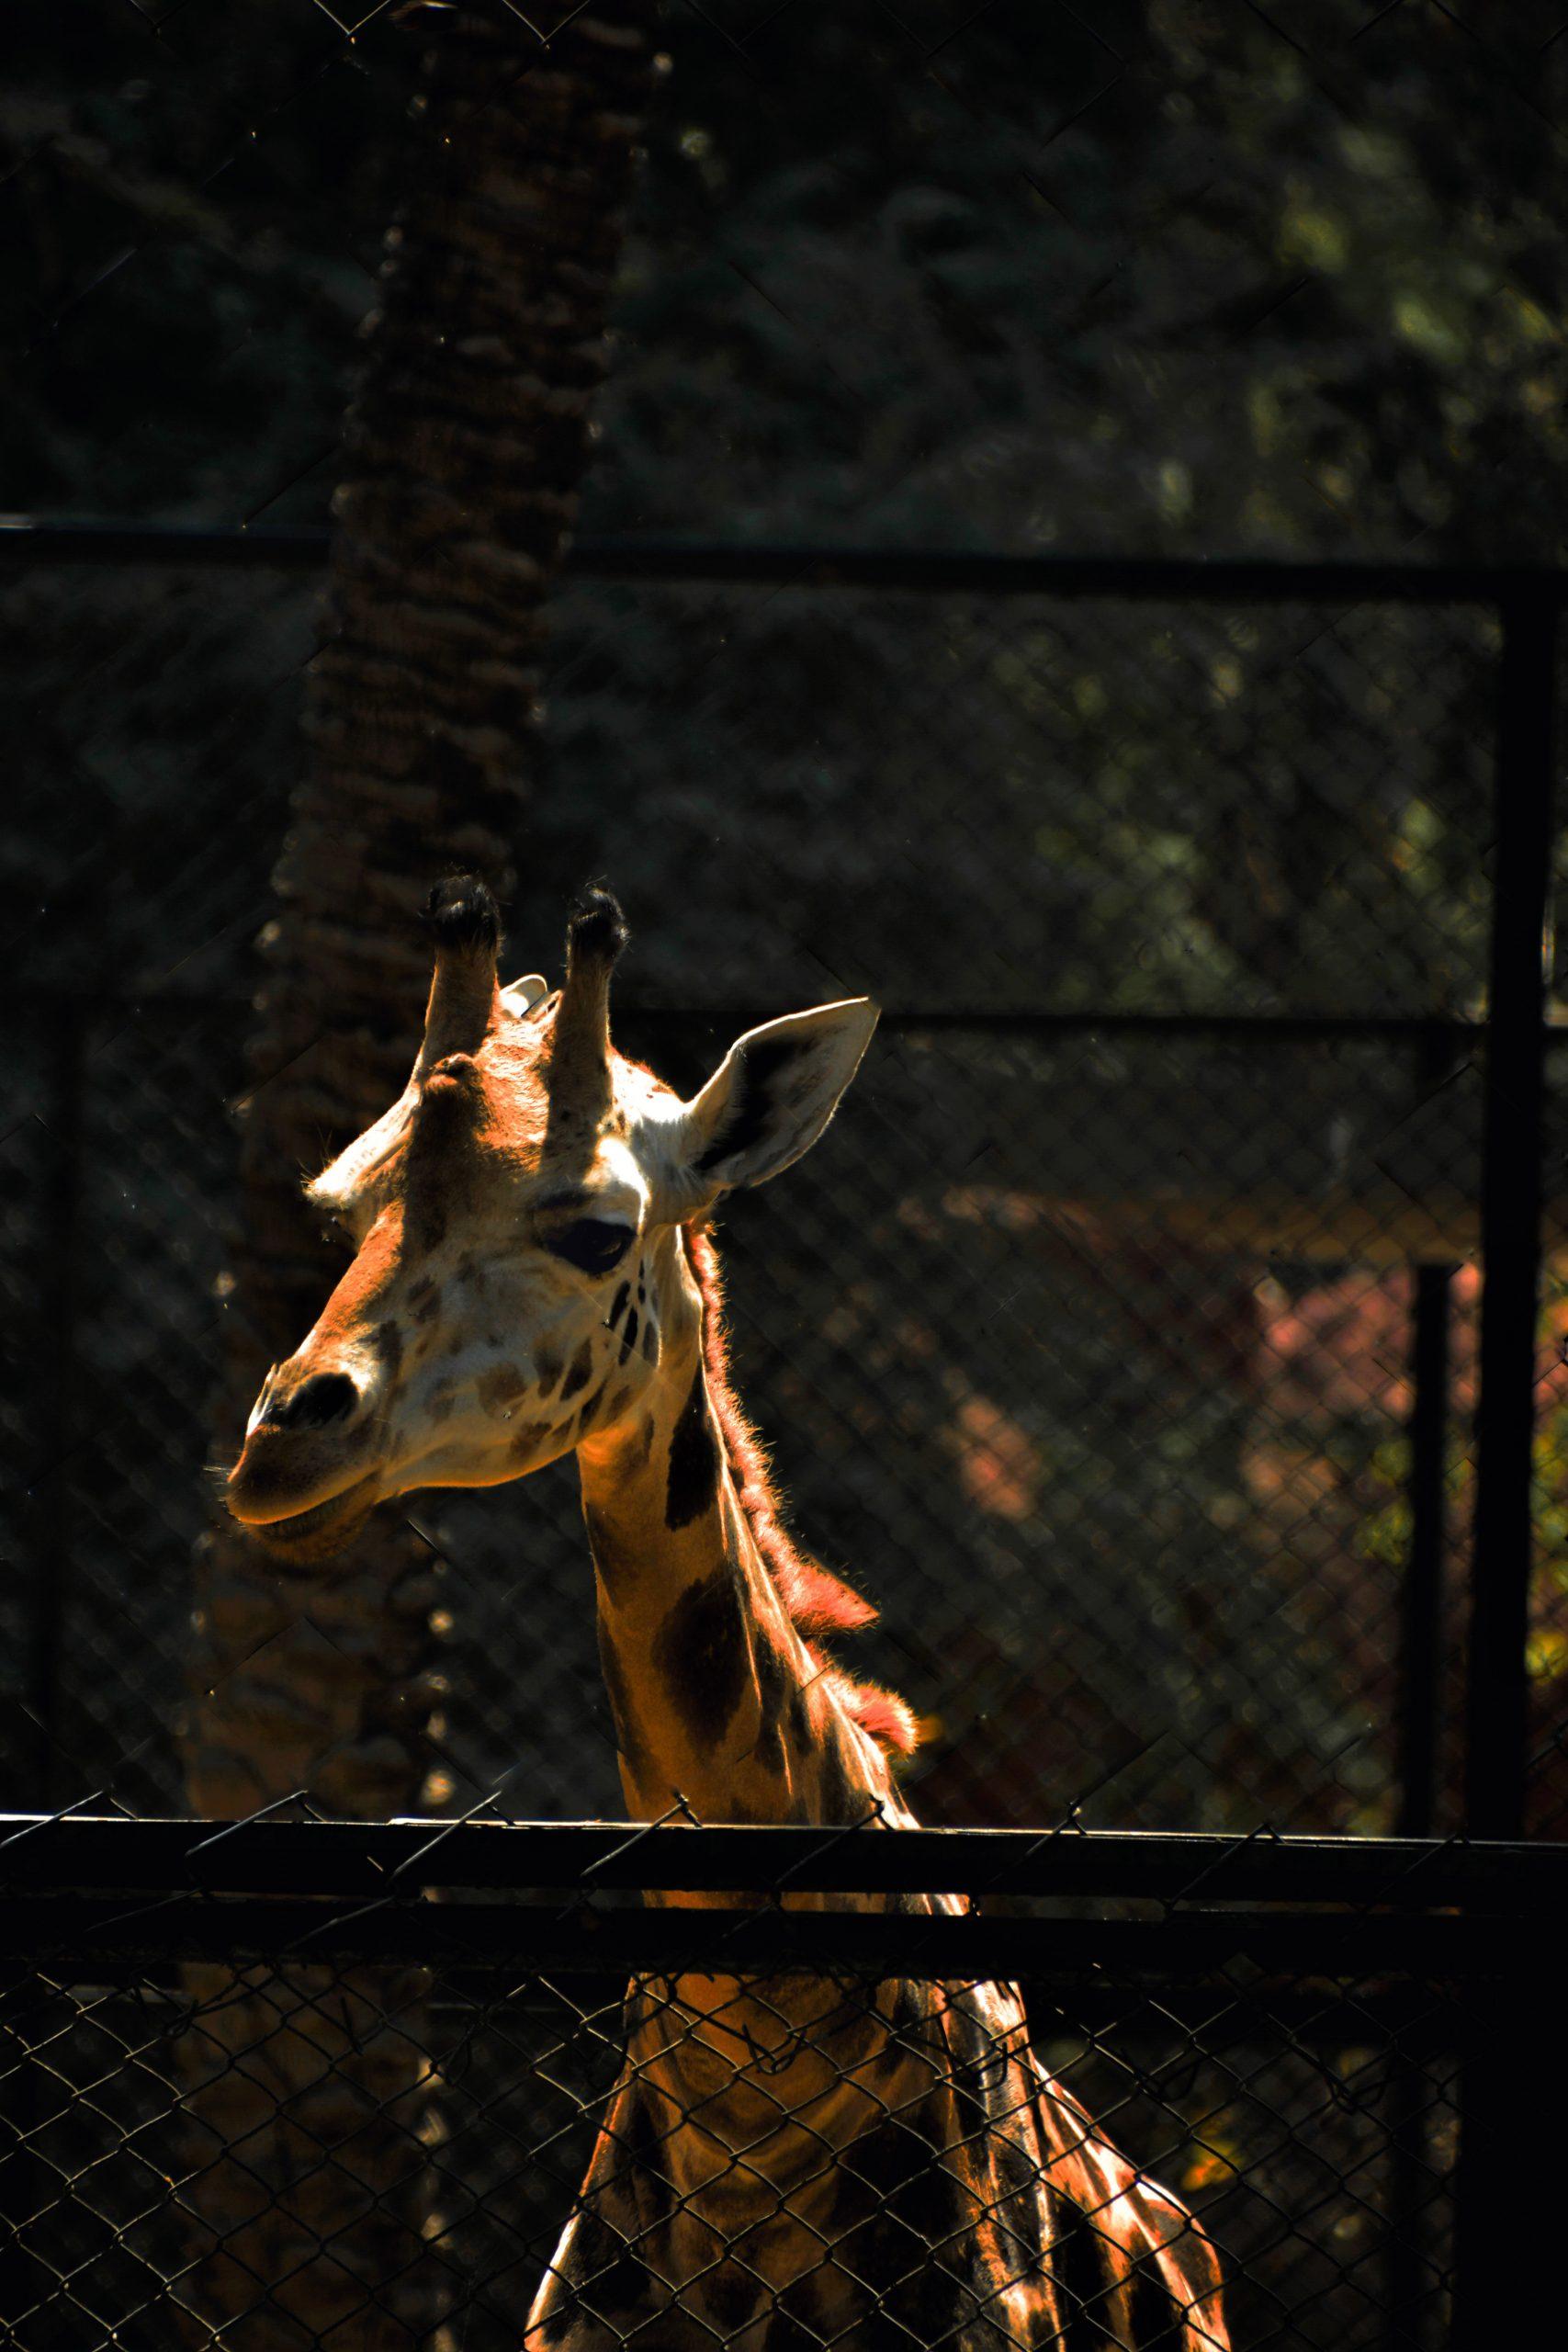 A giraffe in a zoo